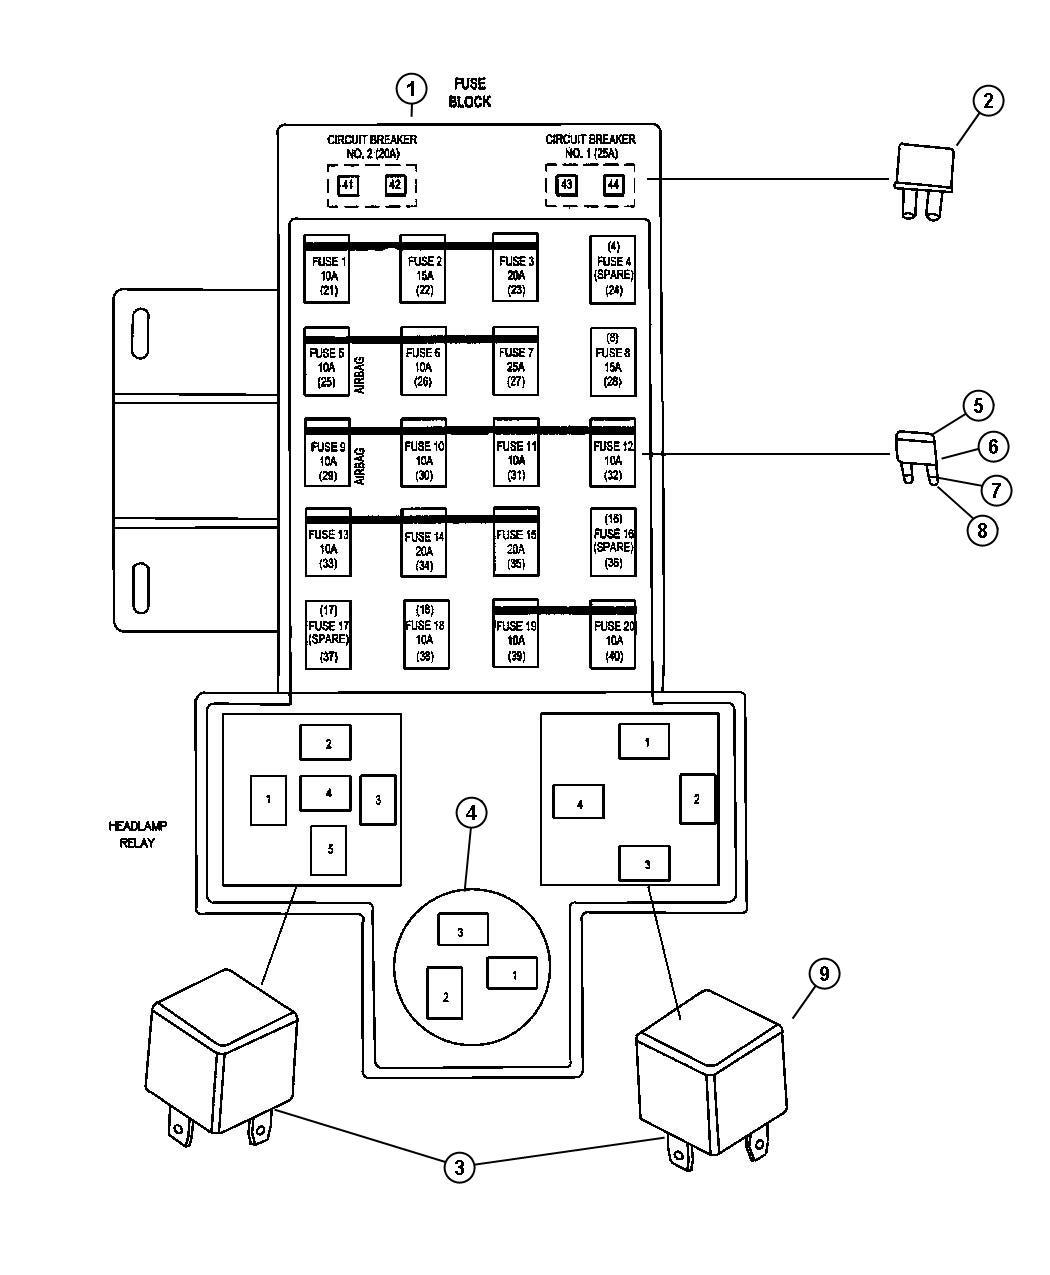 2005 pt cruiser fuse box diagram pioneer avh p4000dvd wiring chrysler relays fuses circuit breakers